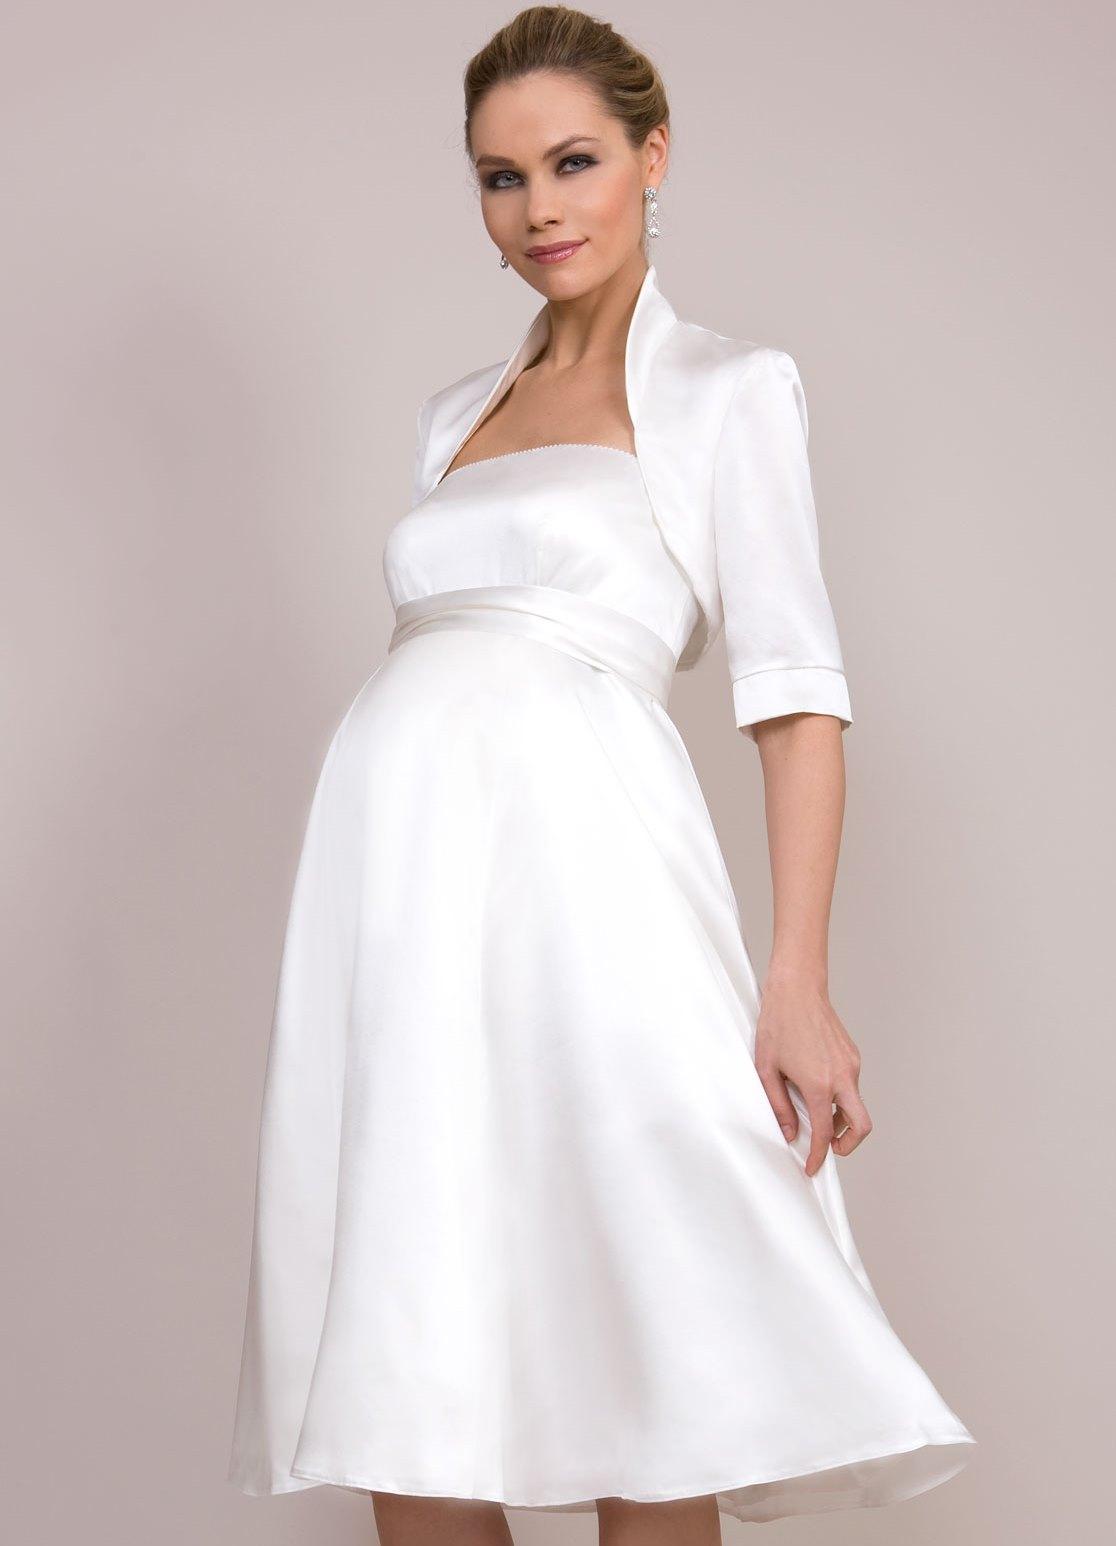 b8d68ba7d211 Свадебные платья для беременных на 5 месяце